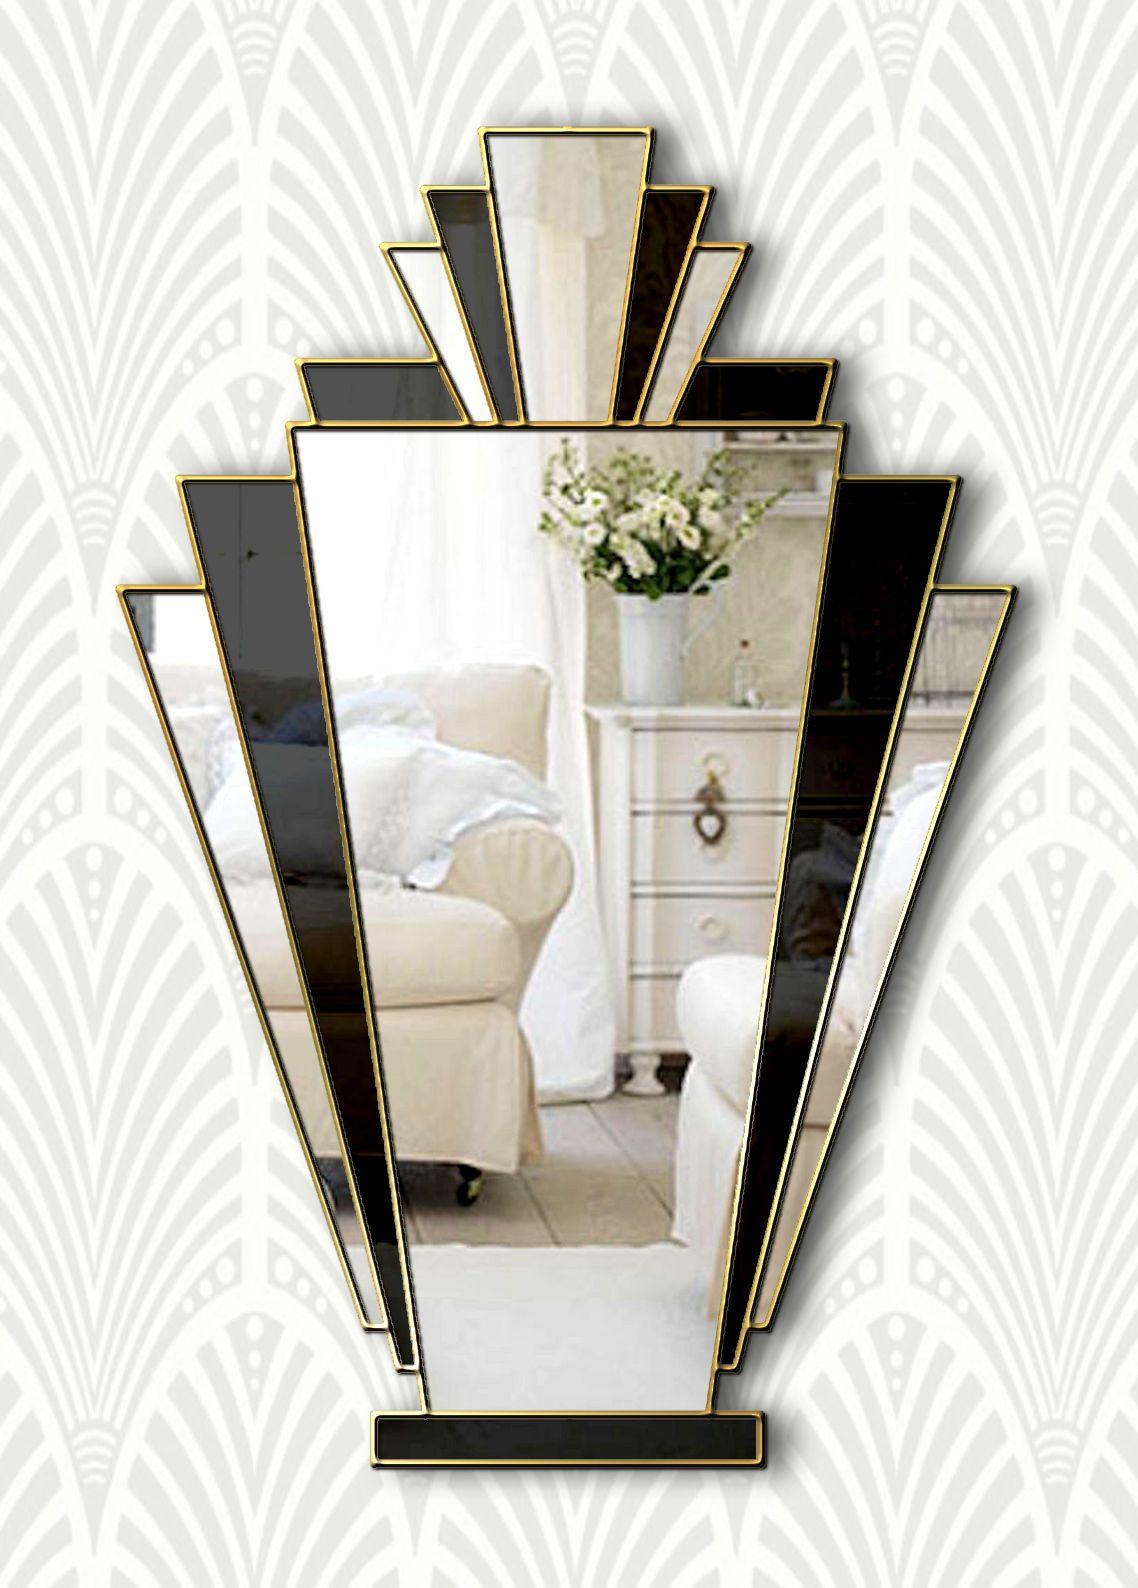 Babushka original handcrafted art deco fan mirror with